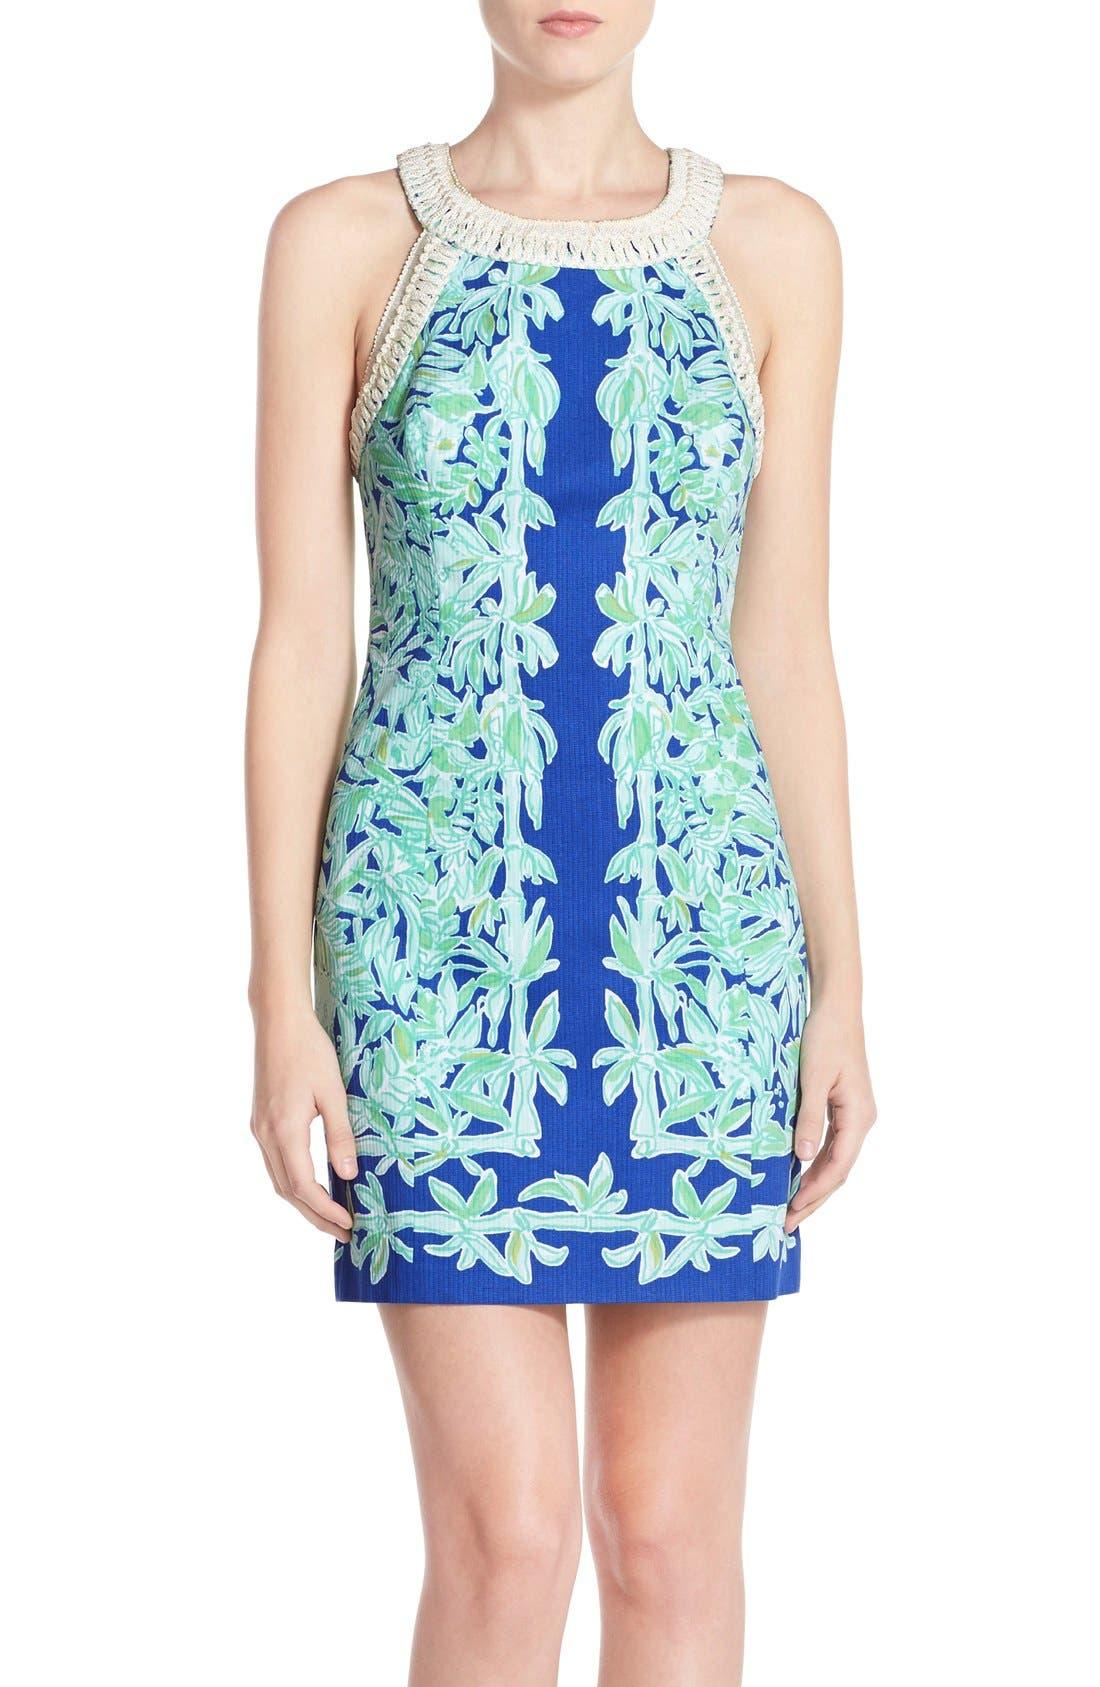 Alternate Image 1 Selected - Lilly Pulitzer® 'Lea' Cotton Shift Sheath Dress